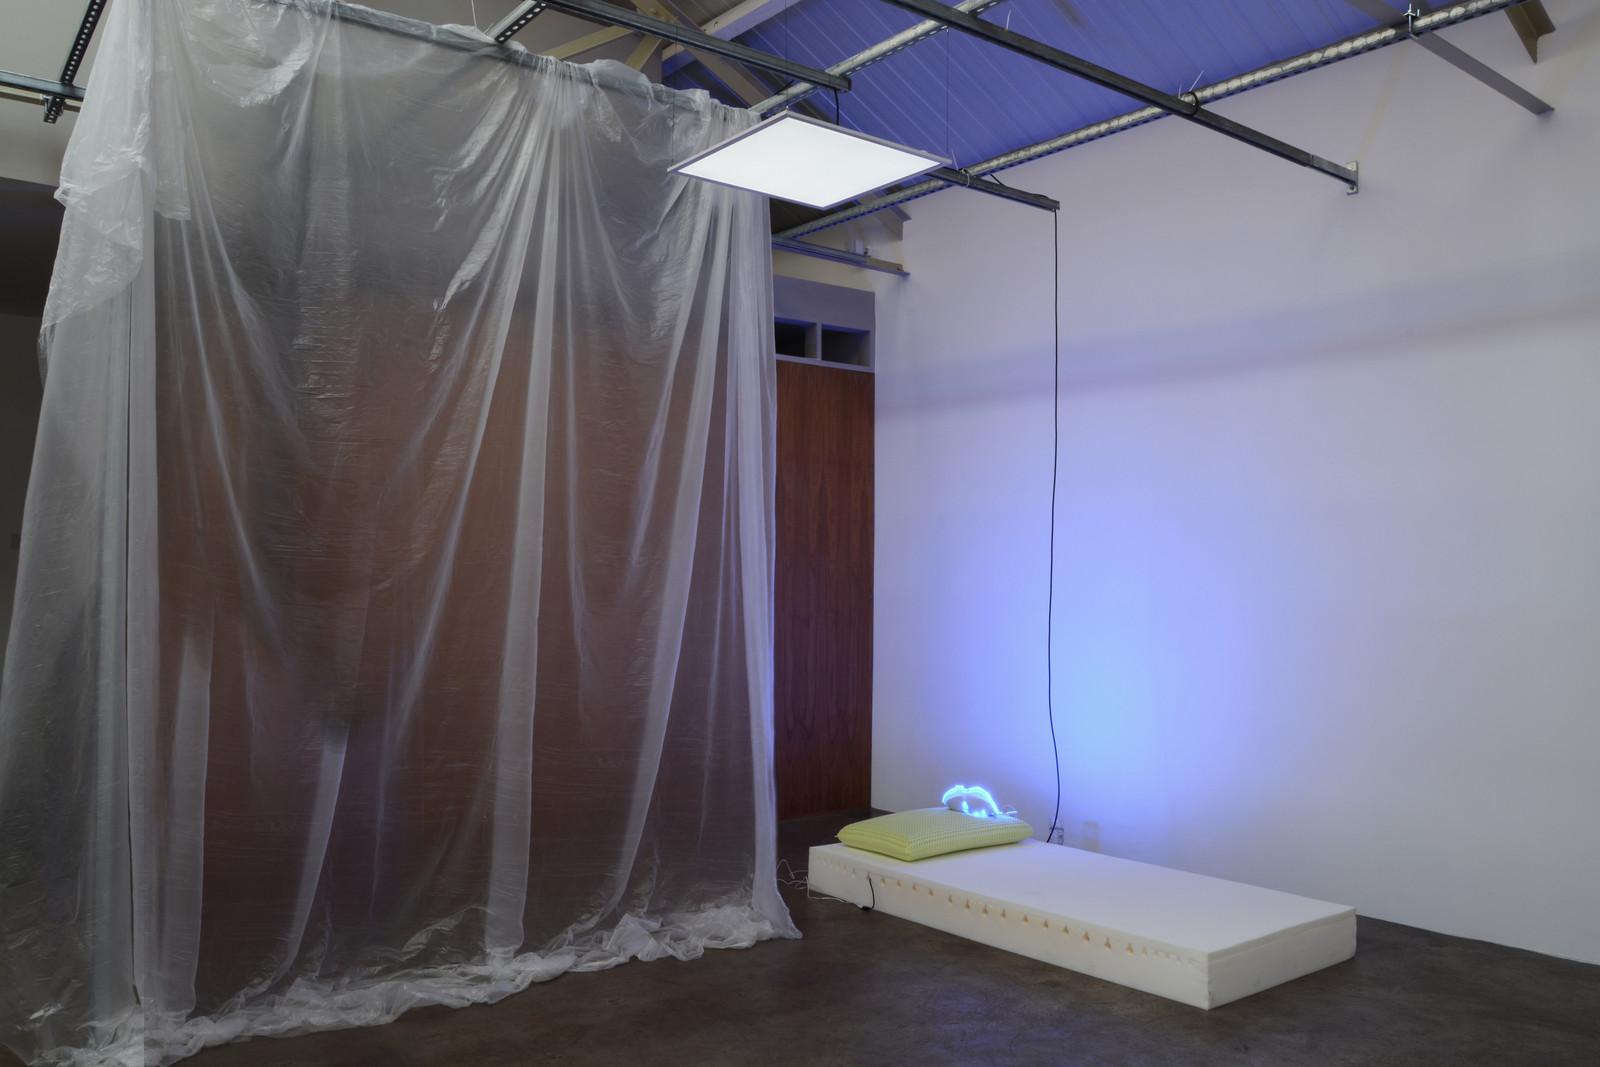 4. Yuri Pattison_sunset provision_installation view_memory foam memory